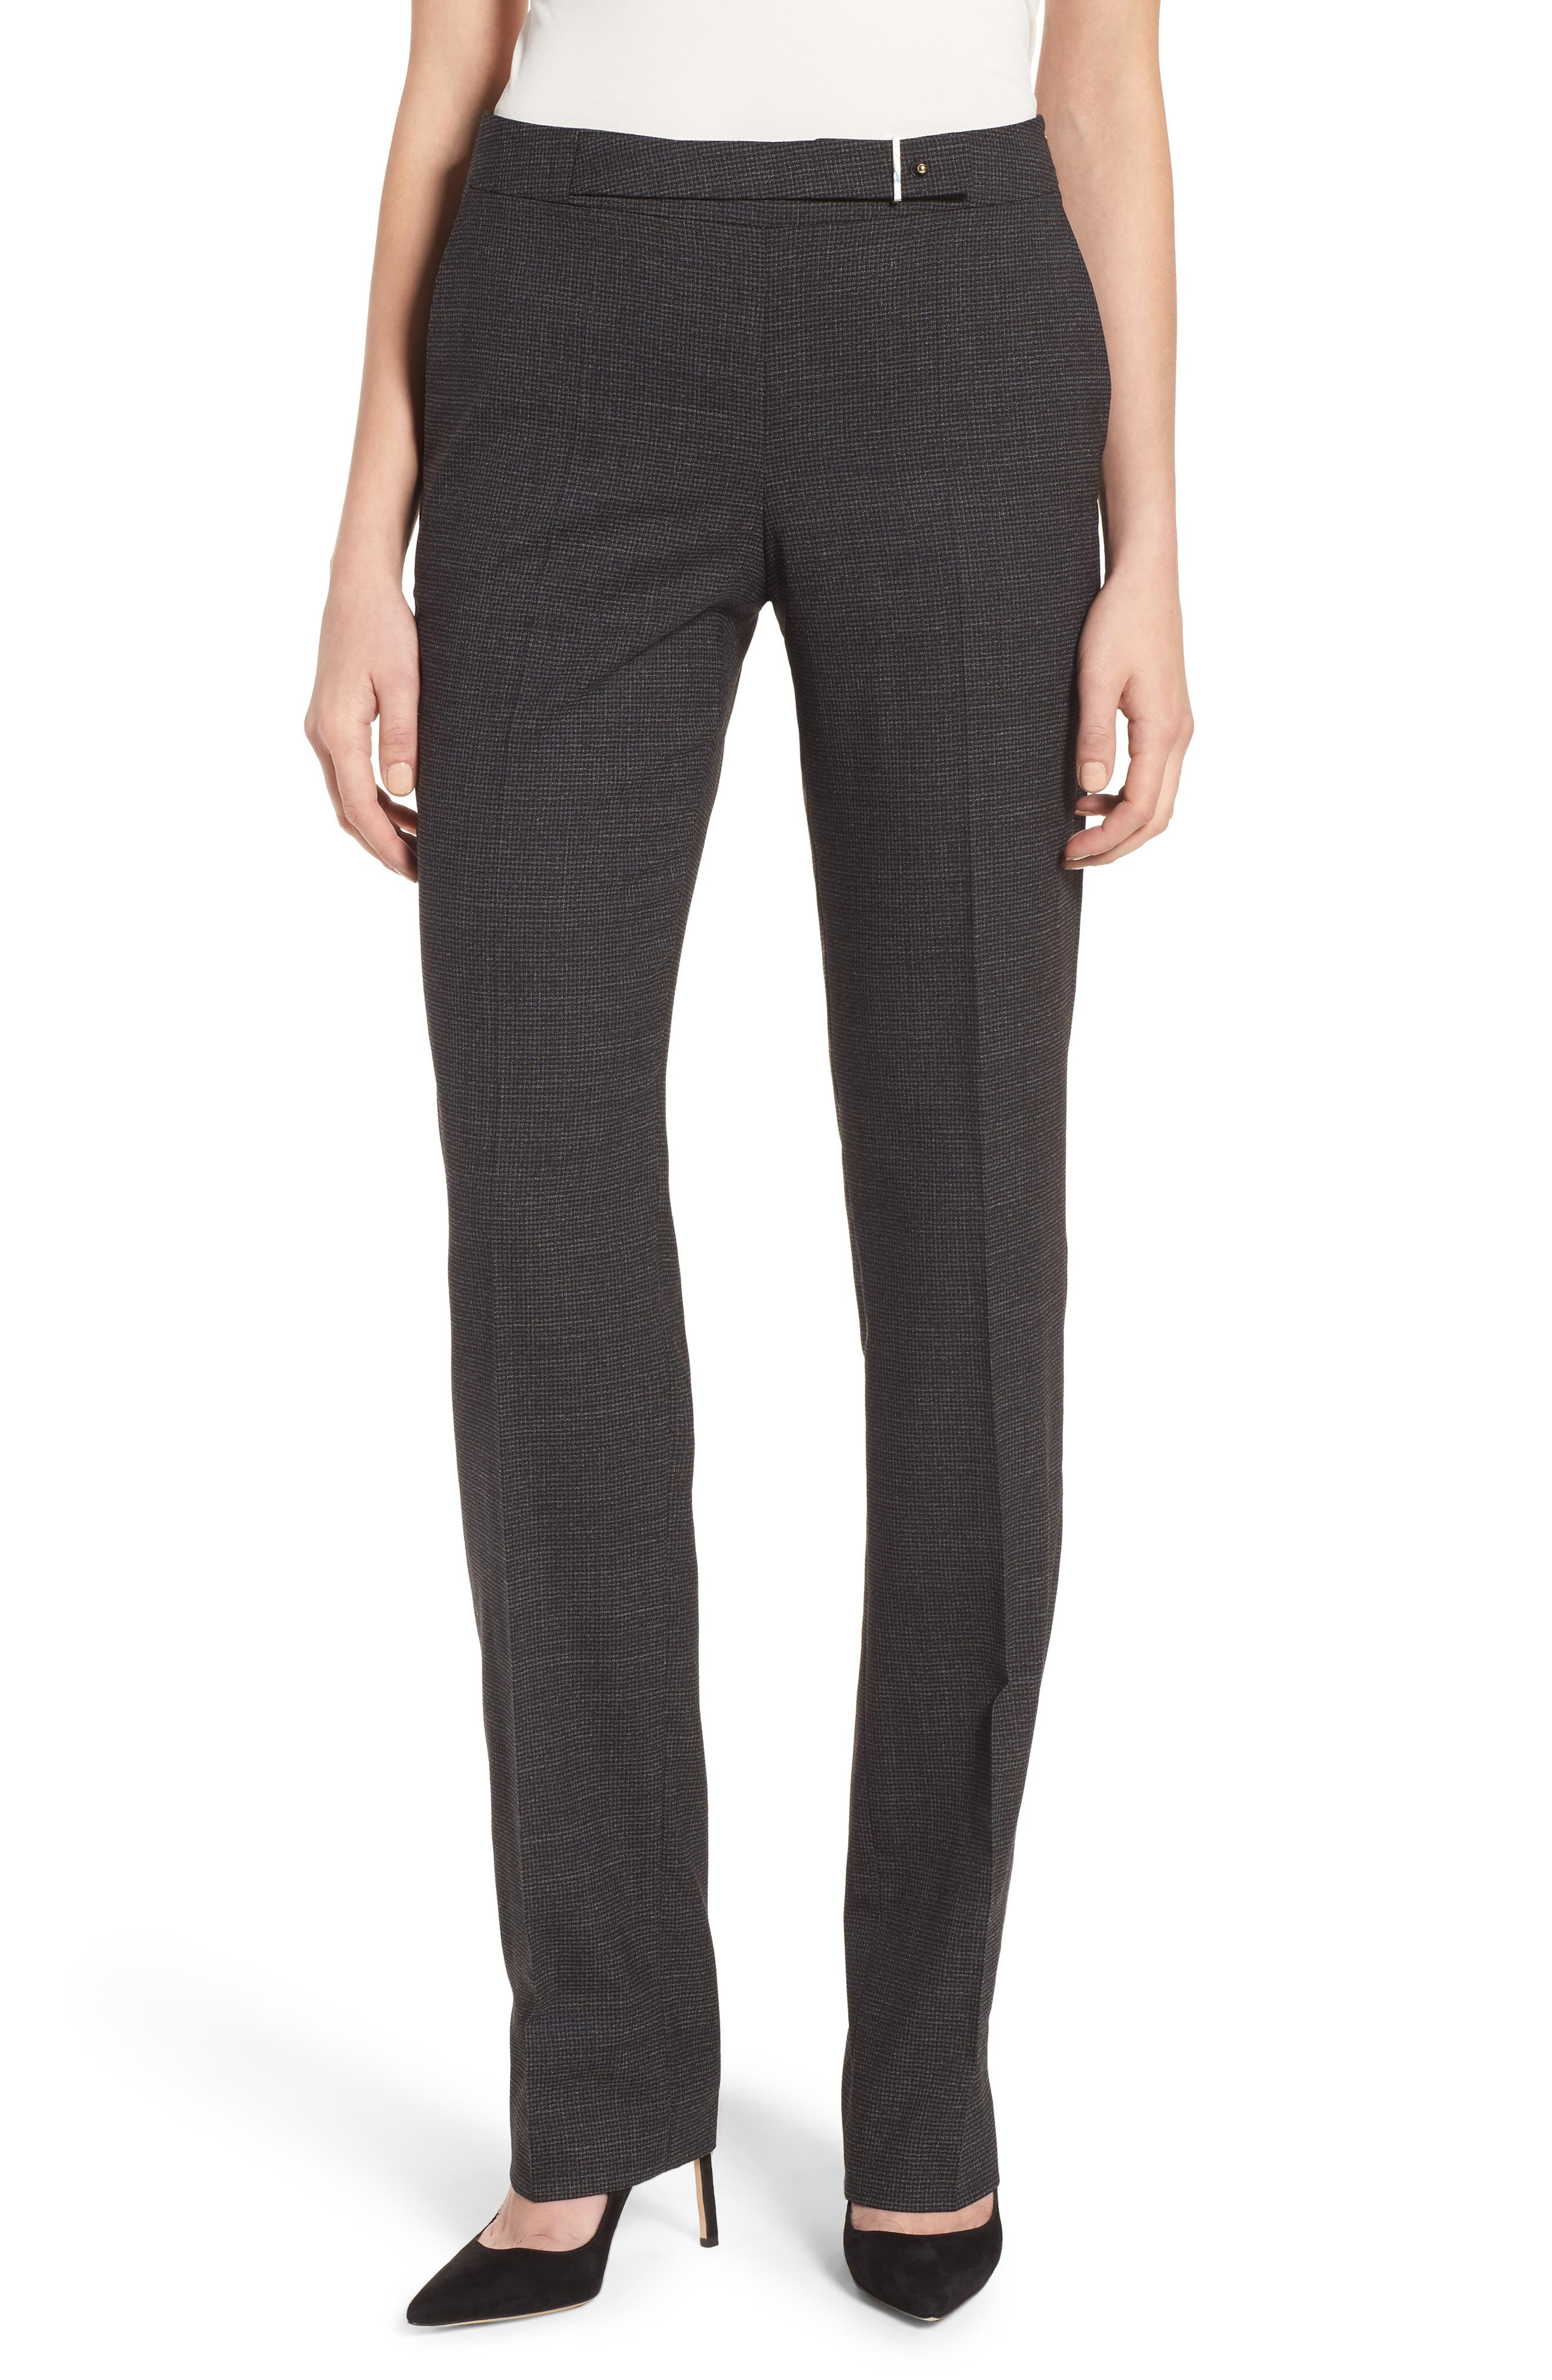 Tafena Check Stretch Wool Pants,                         Main,                         color, 006